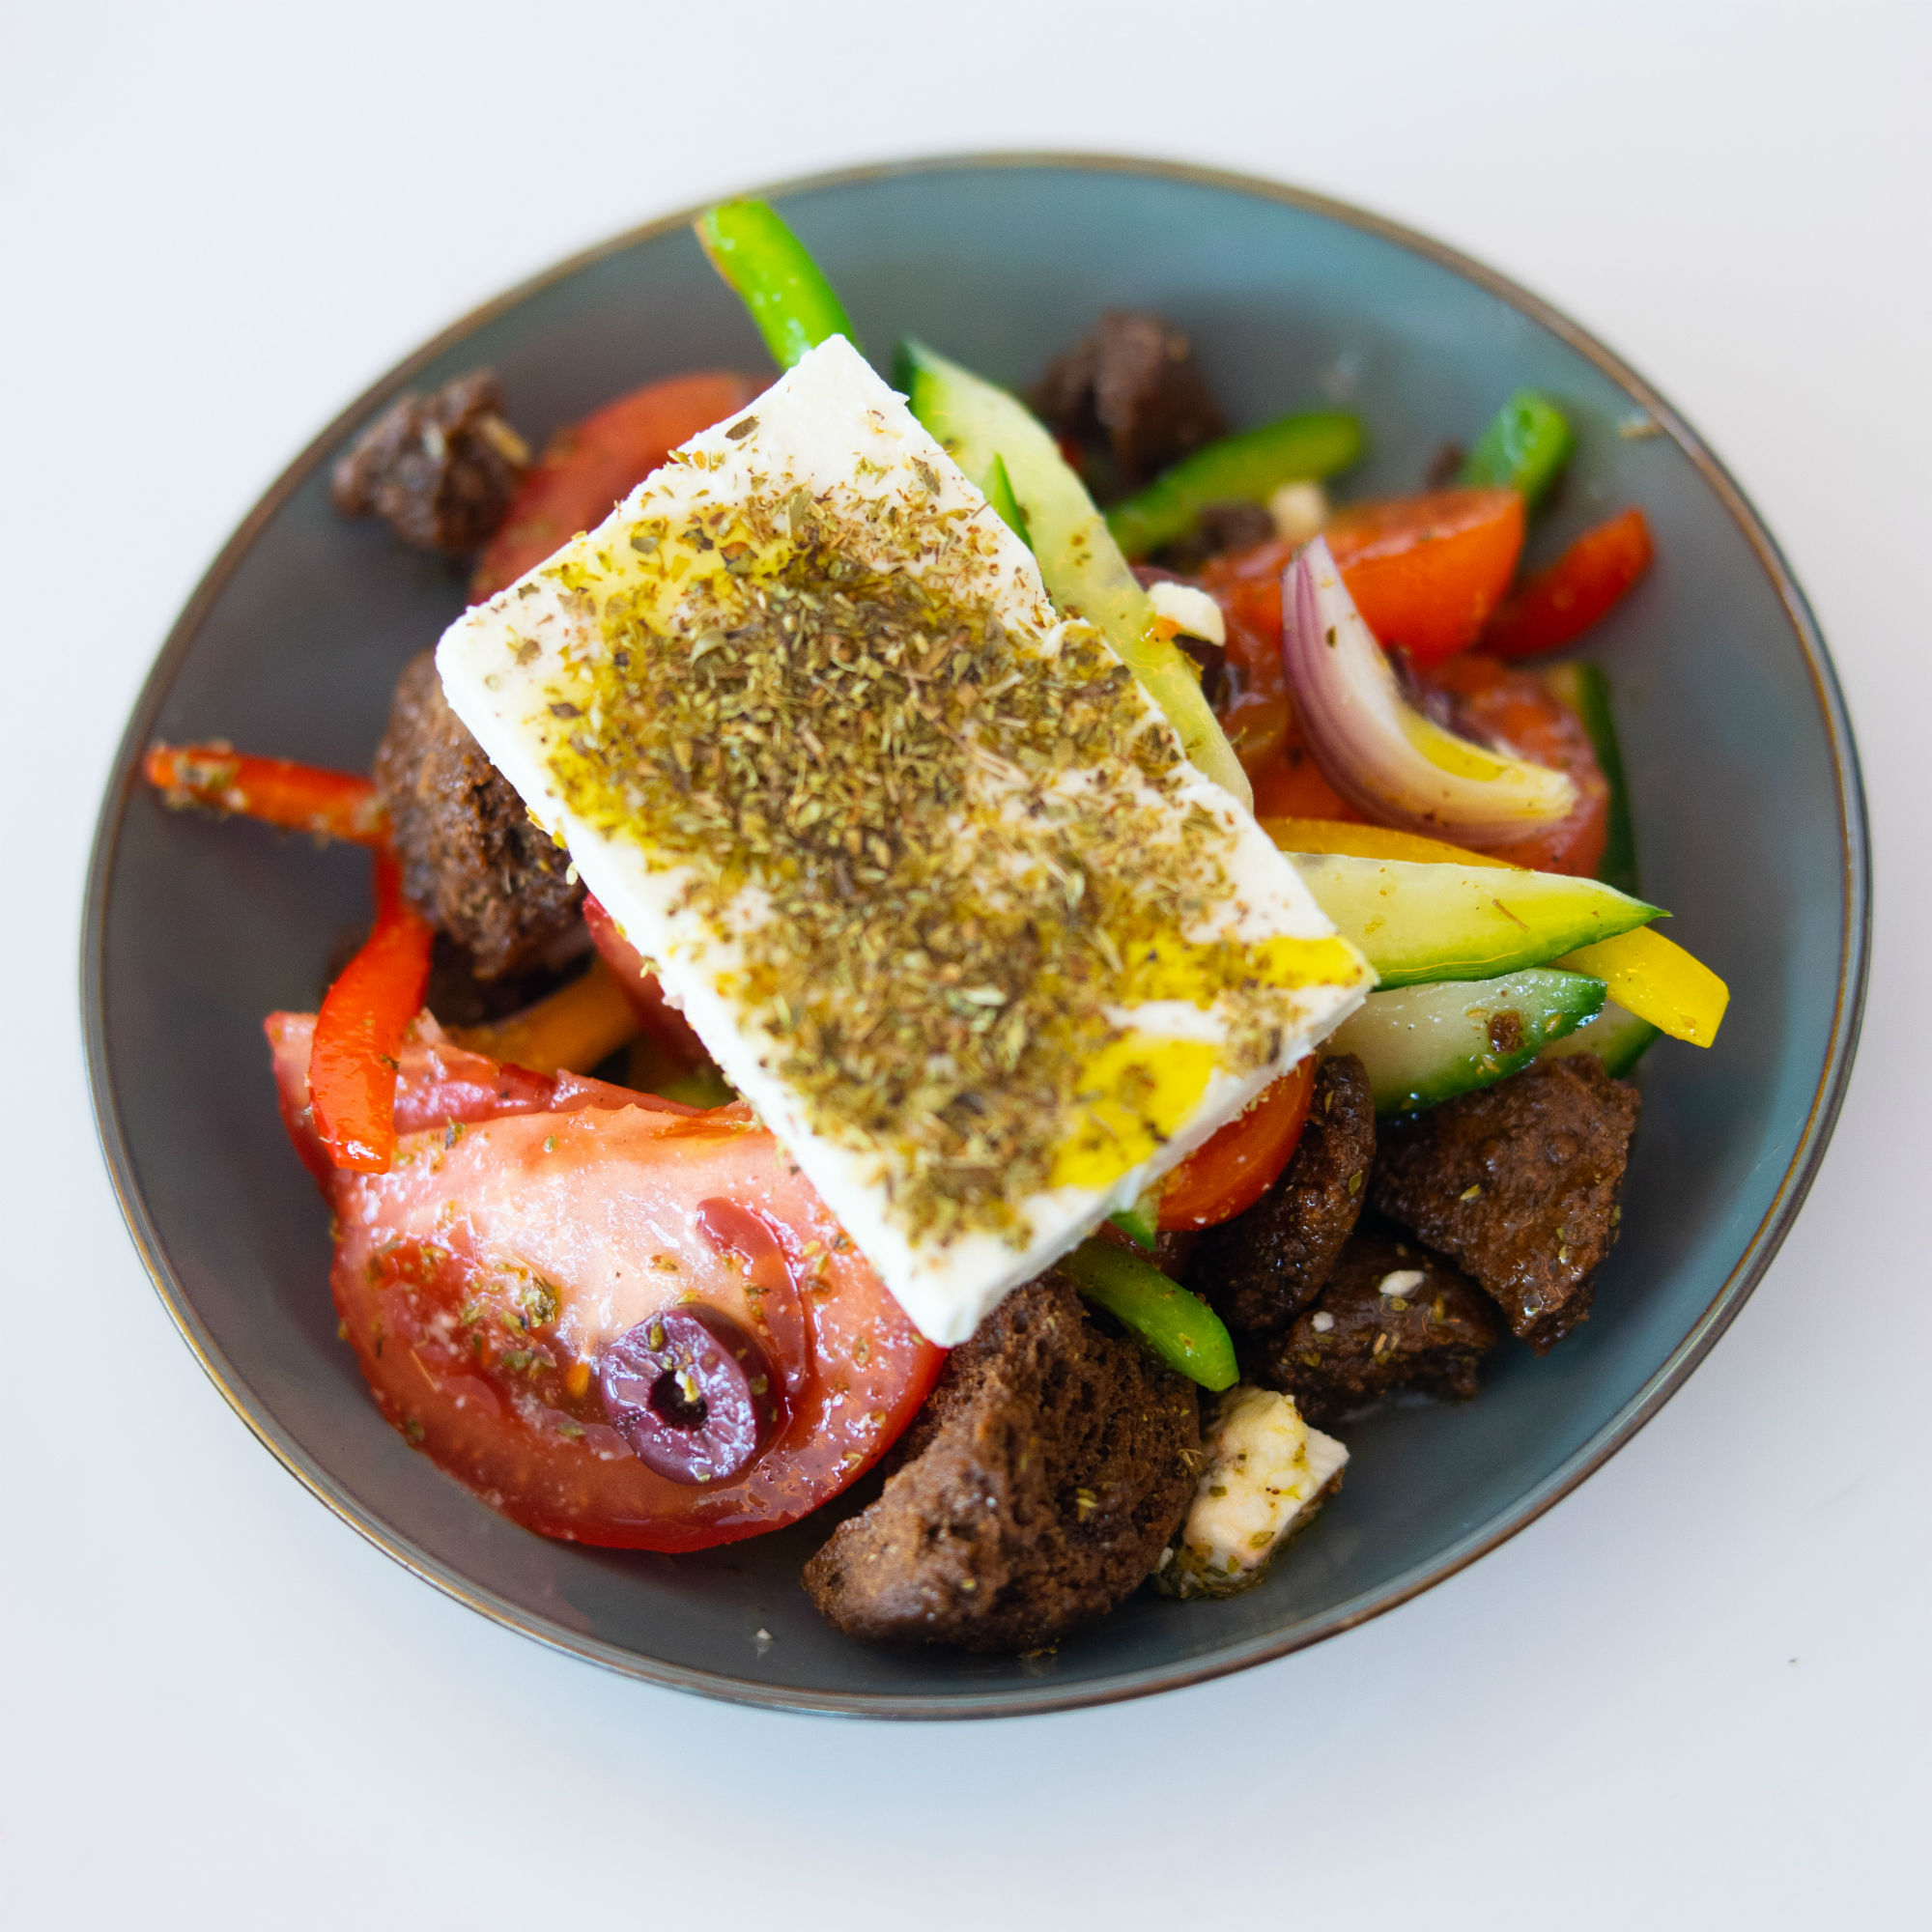 Greek Salad at The Lighthouse